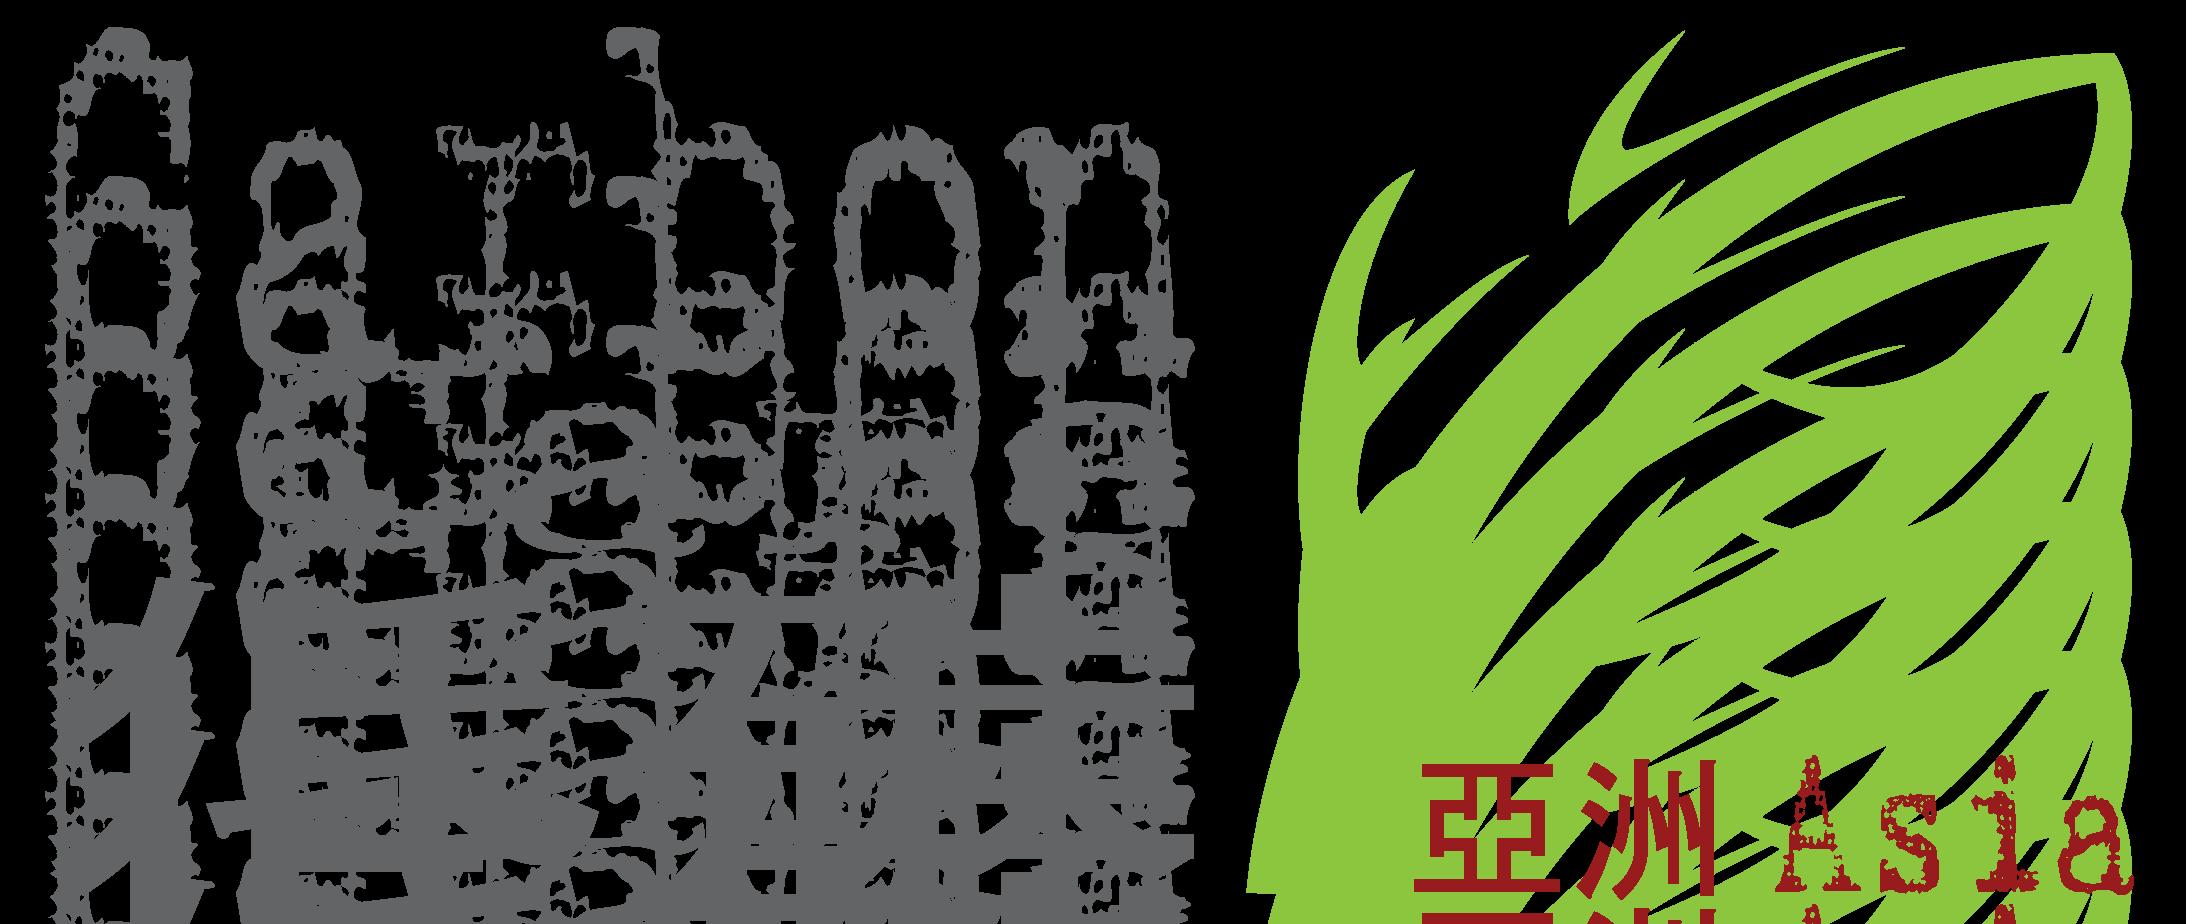 Carbon care asia